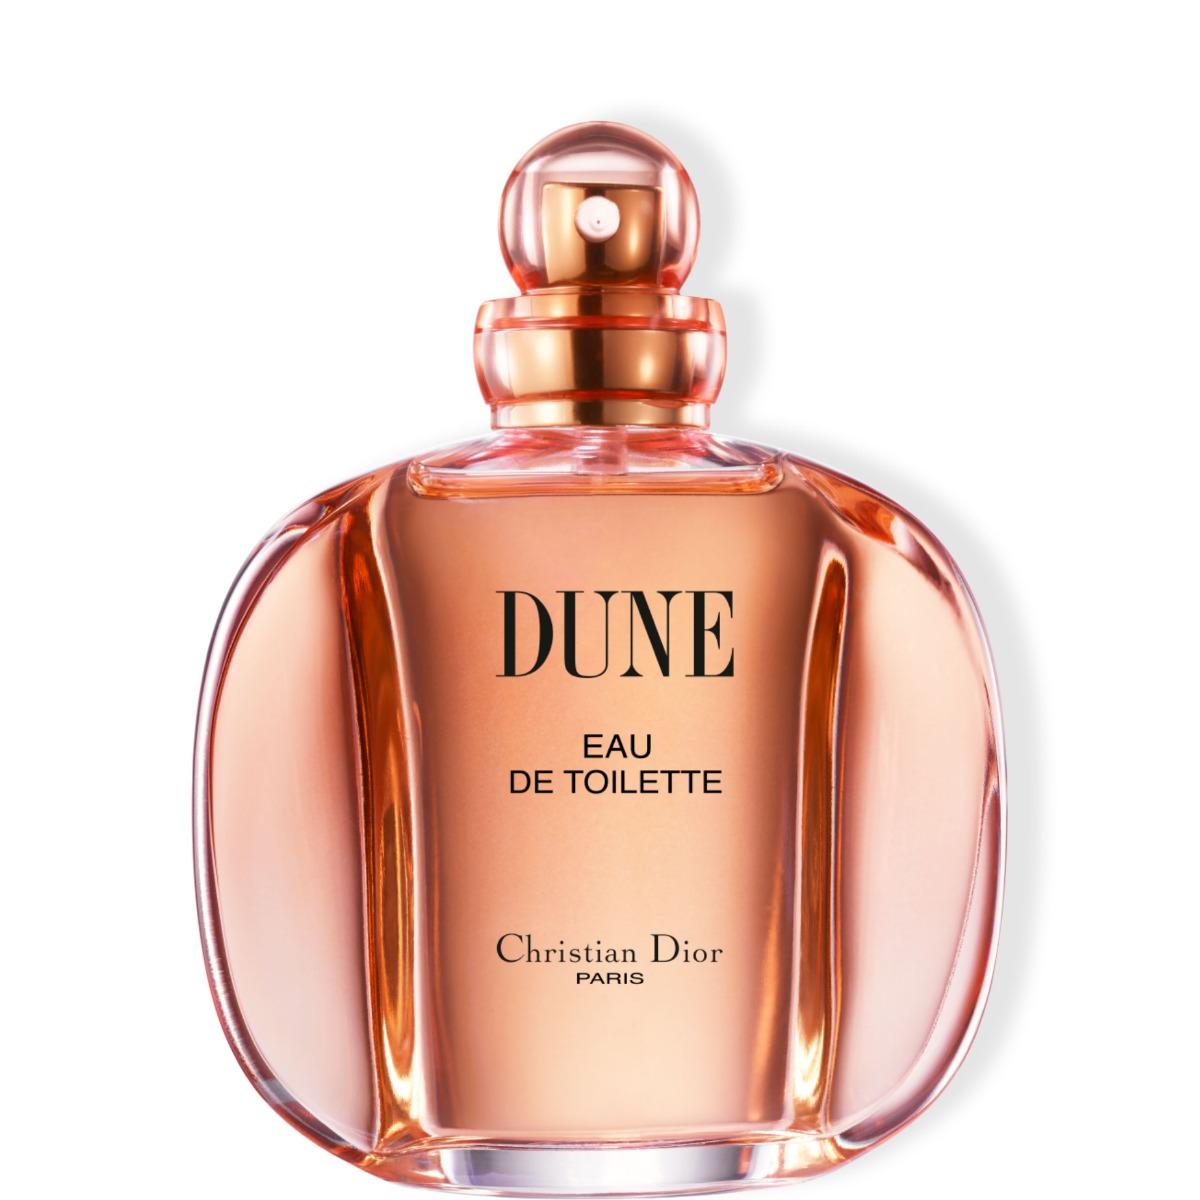 Afbeelding van Christian Dior Dune Eau de toilette 100 ml